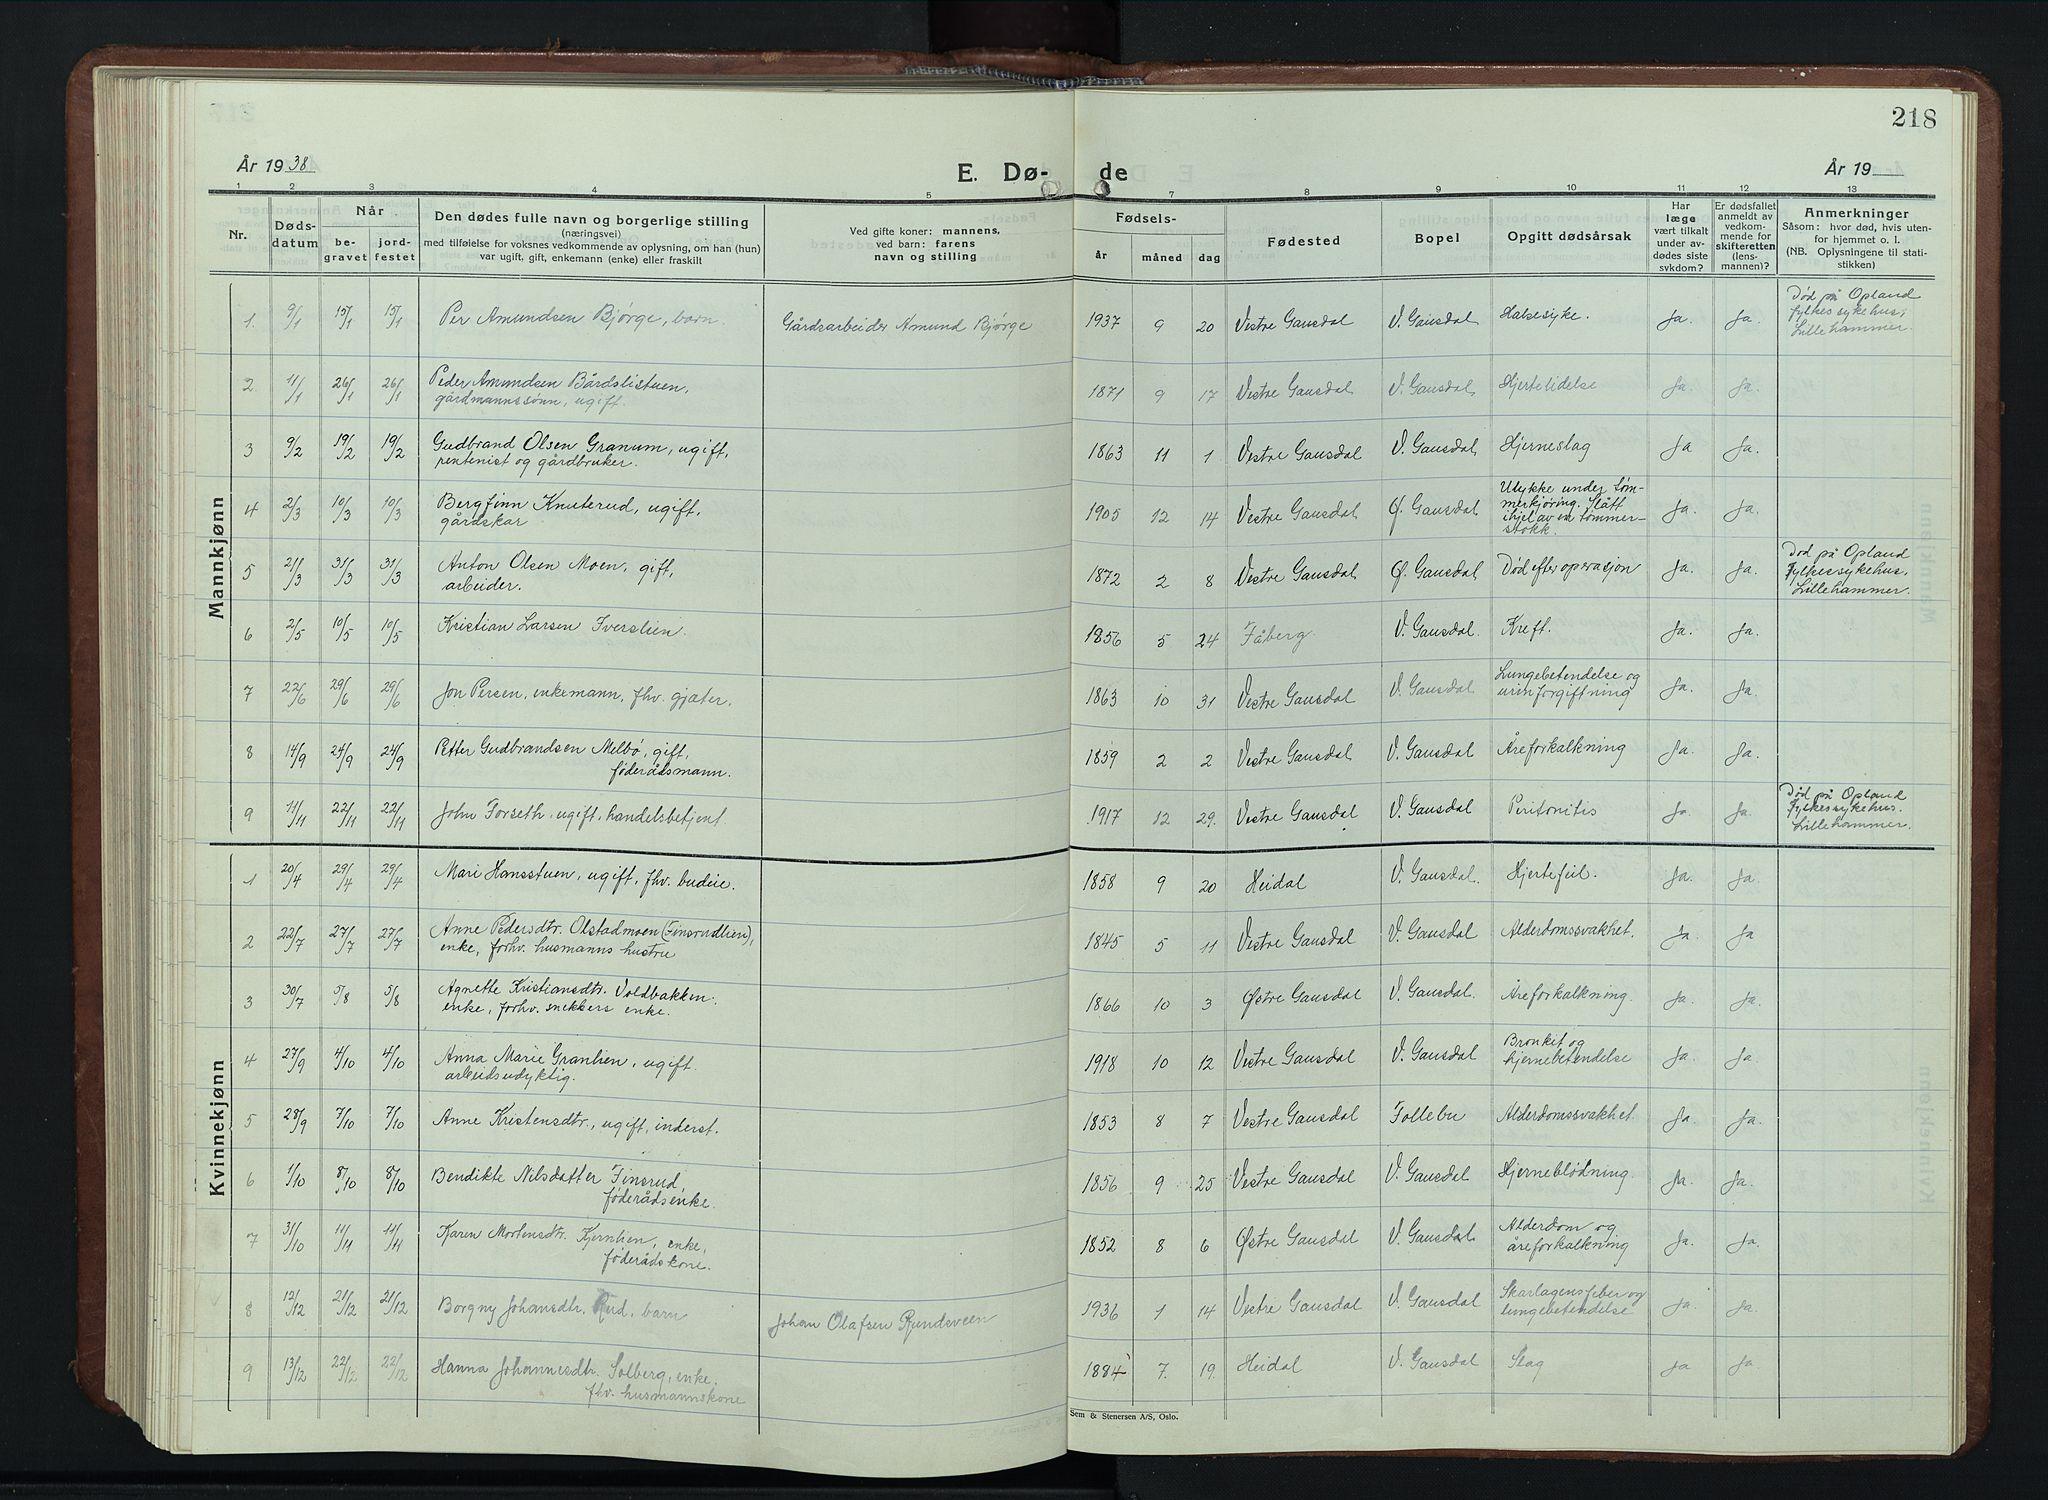 SAH, Vestre Gausdal prestekontor, Klokkerbok nr. 5, 1926-1955, s. 218